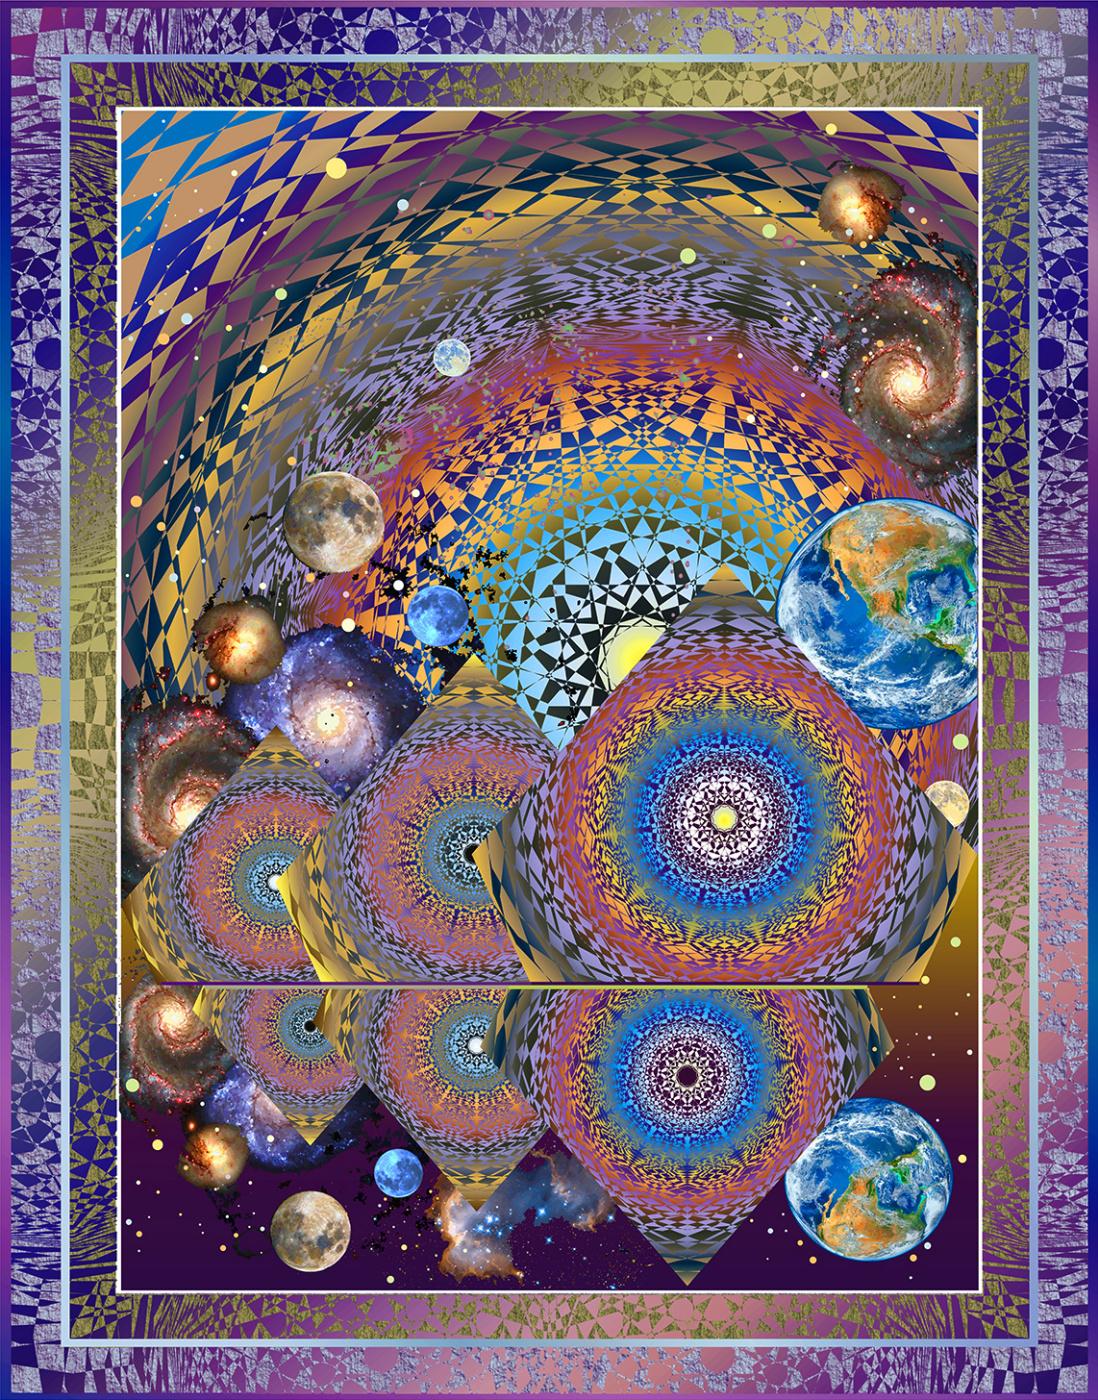 Юрий Николаевич Сафонов (Yury Safonov). Pyramids of Atlantis (a world of other energies and realities)